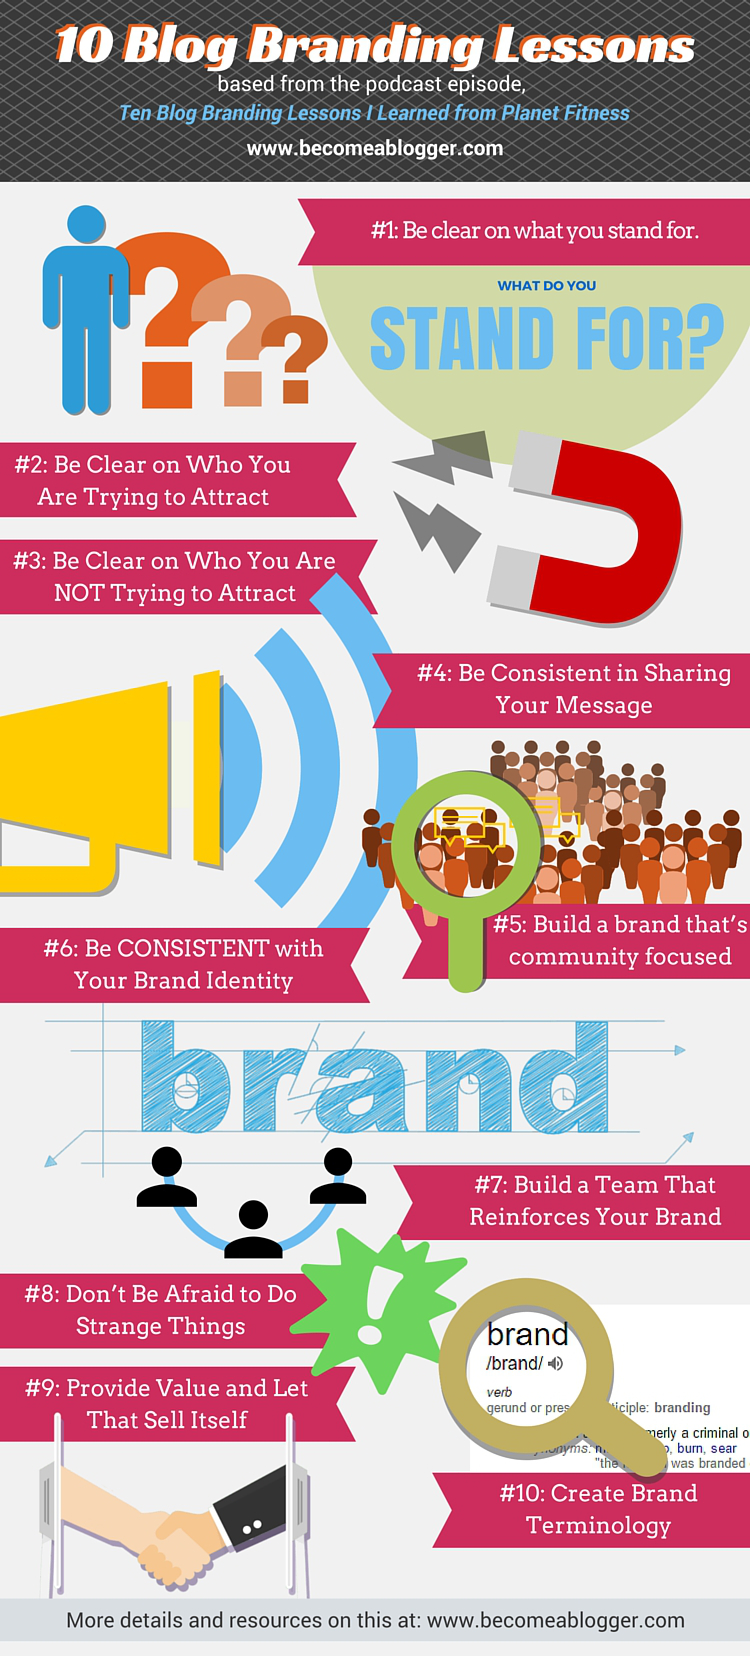 229_Planet Fitness Branding_Infographic_1